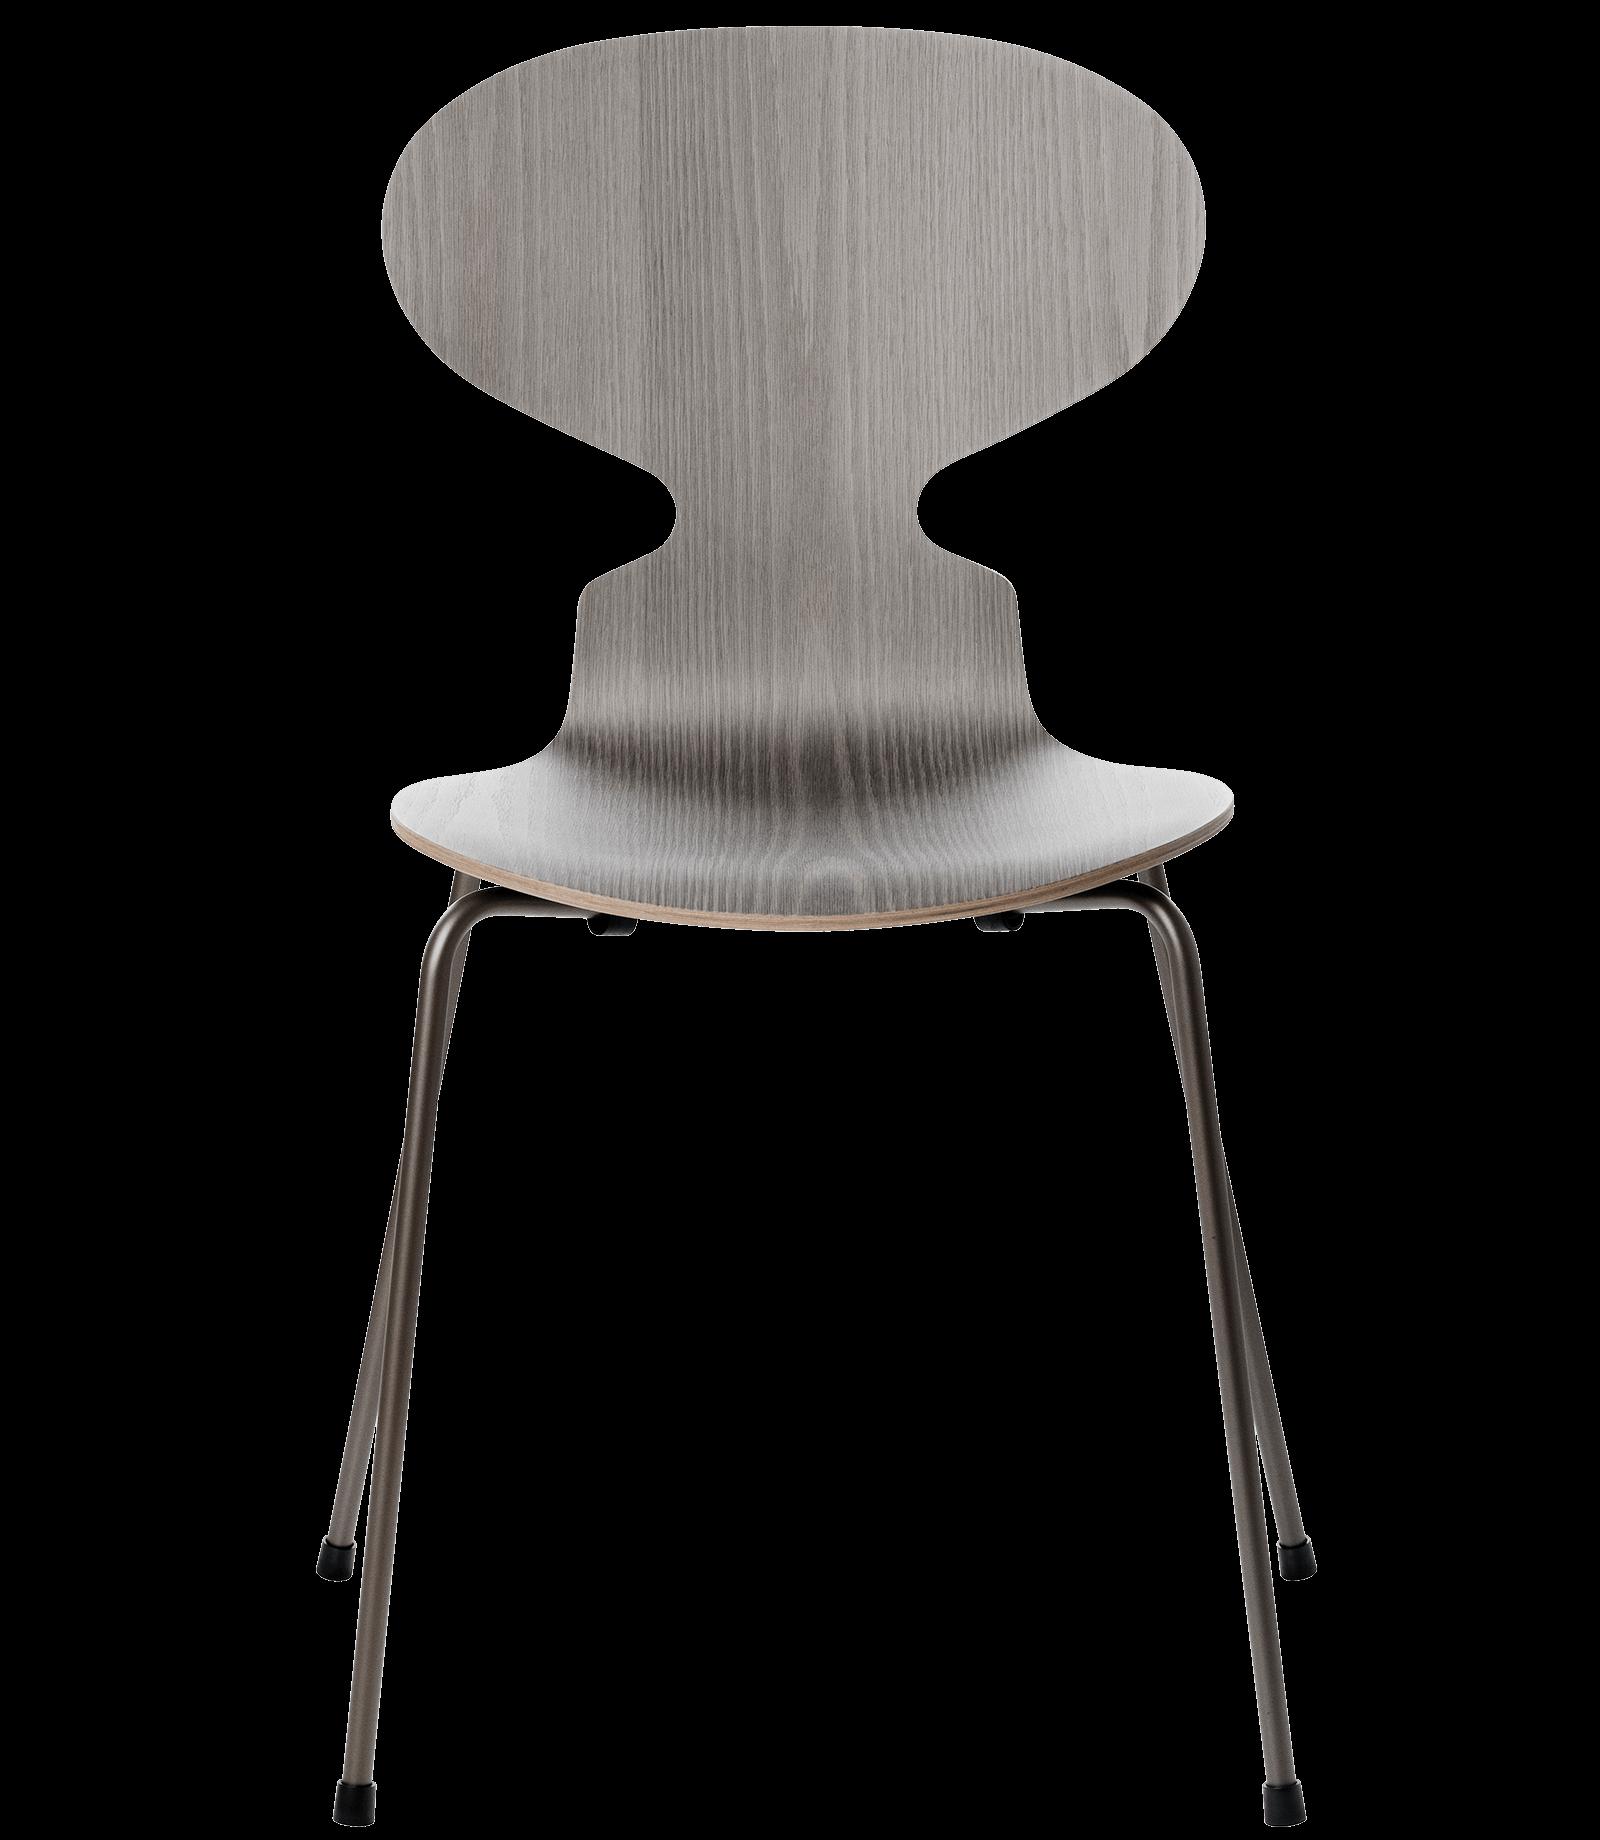 Arne Jacobsen designede originalt Myren™ til kantinen hos Novo ...